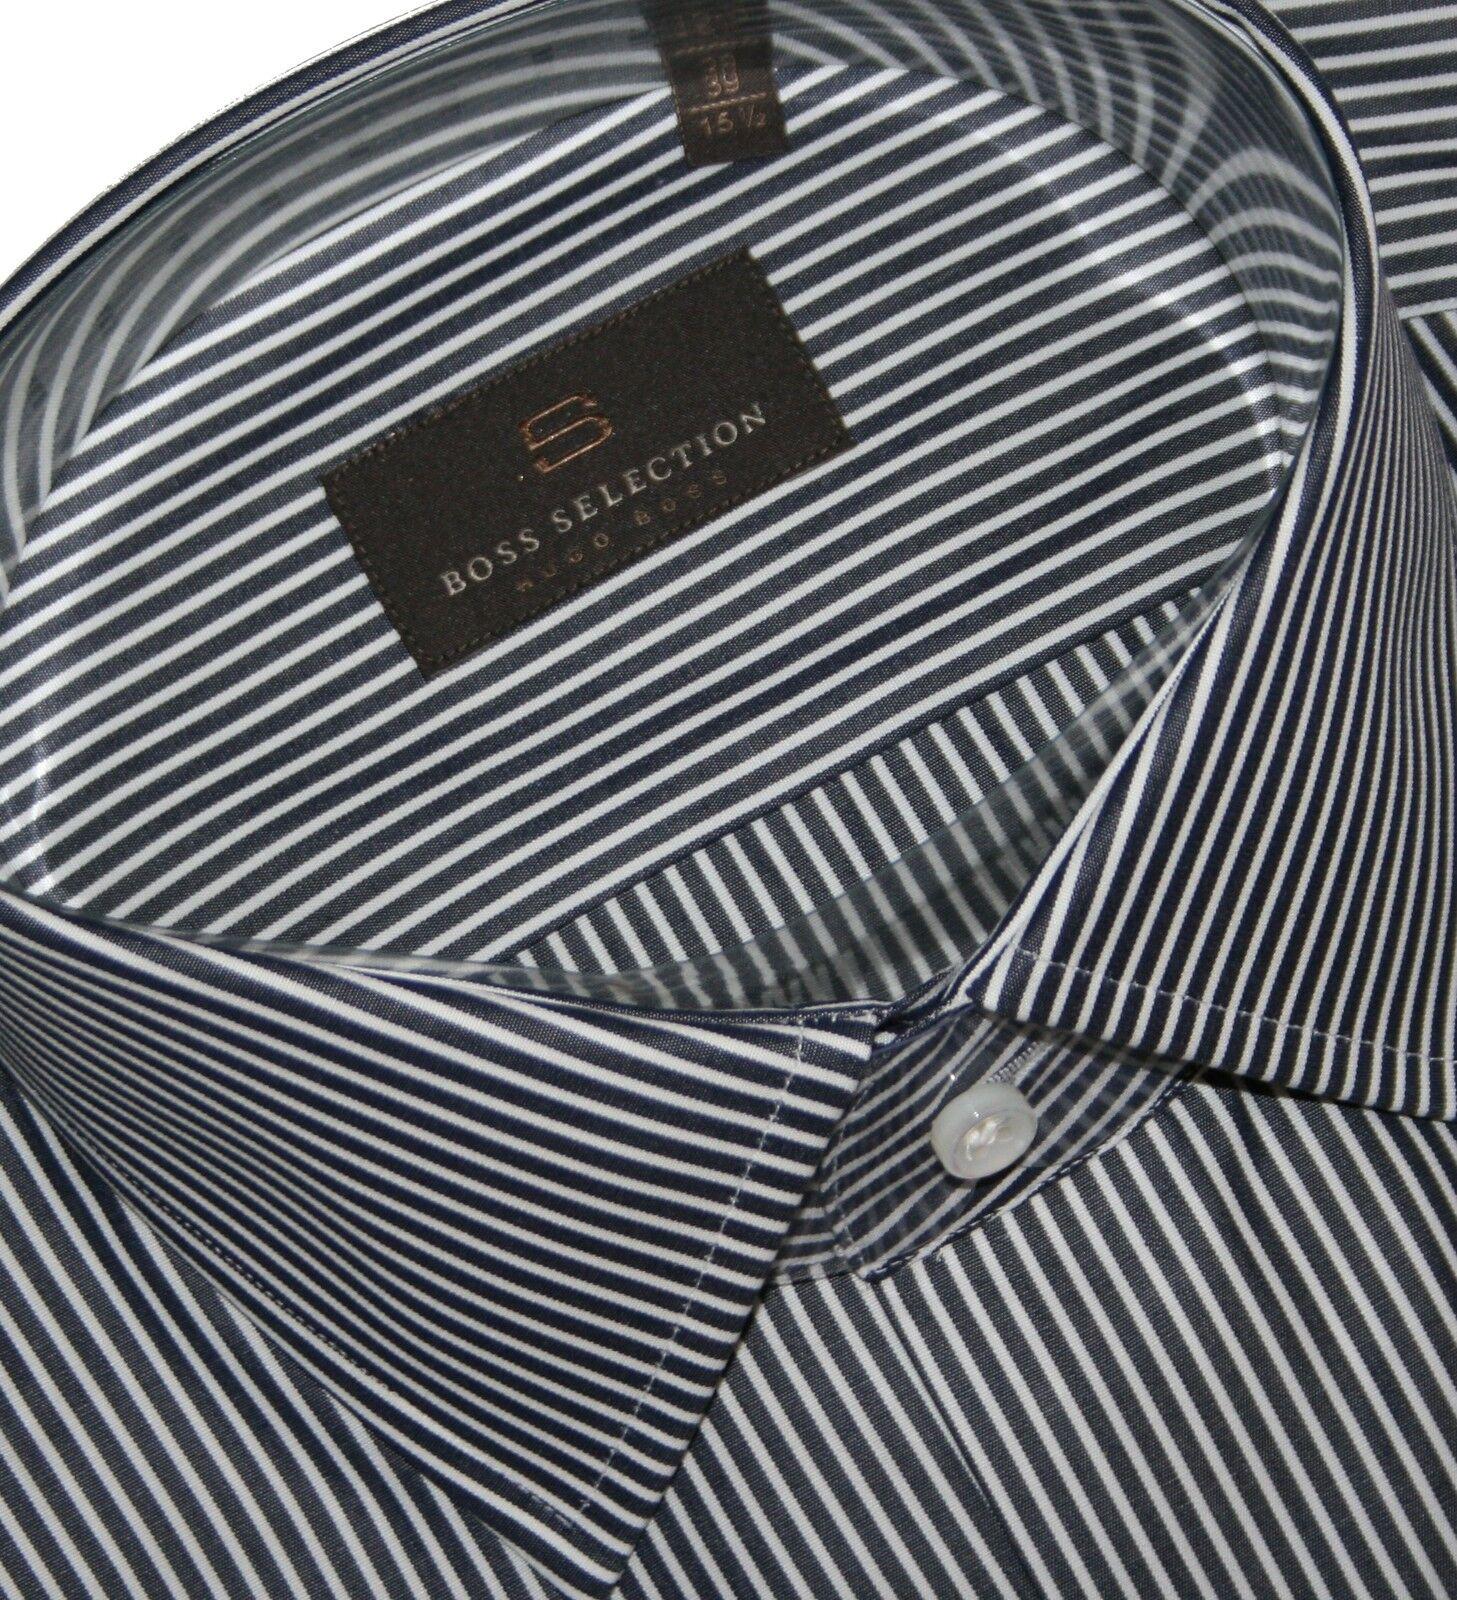 Hugo Boss Selection 50239300 Dark Blau Stripe Stripe Stripe Stirling Hemd KW.39, 40, 43 & 44 | Online-Shop  7cbd6b